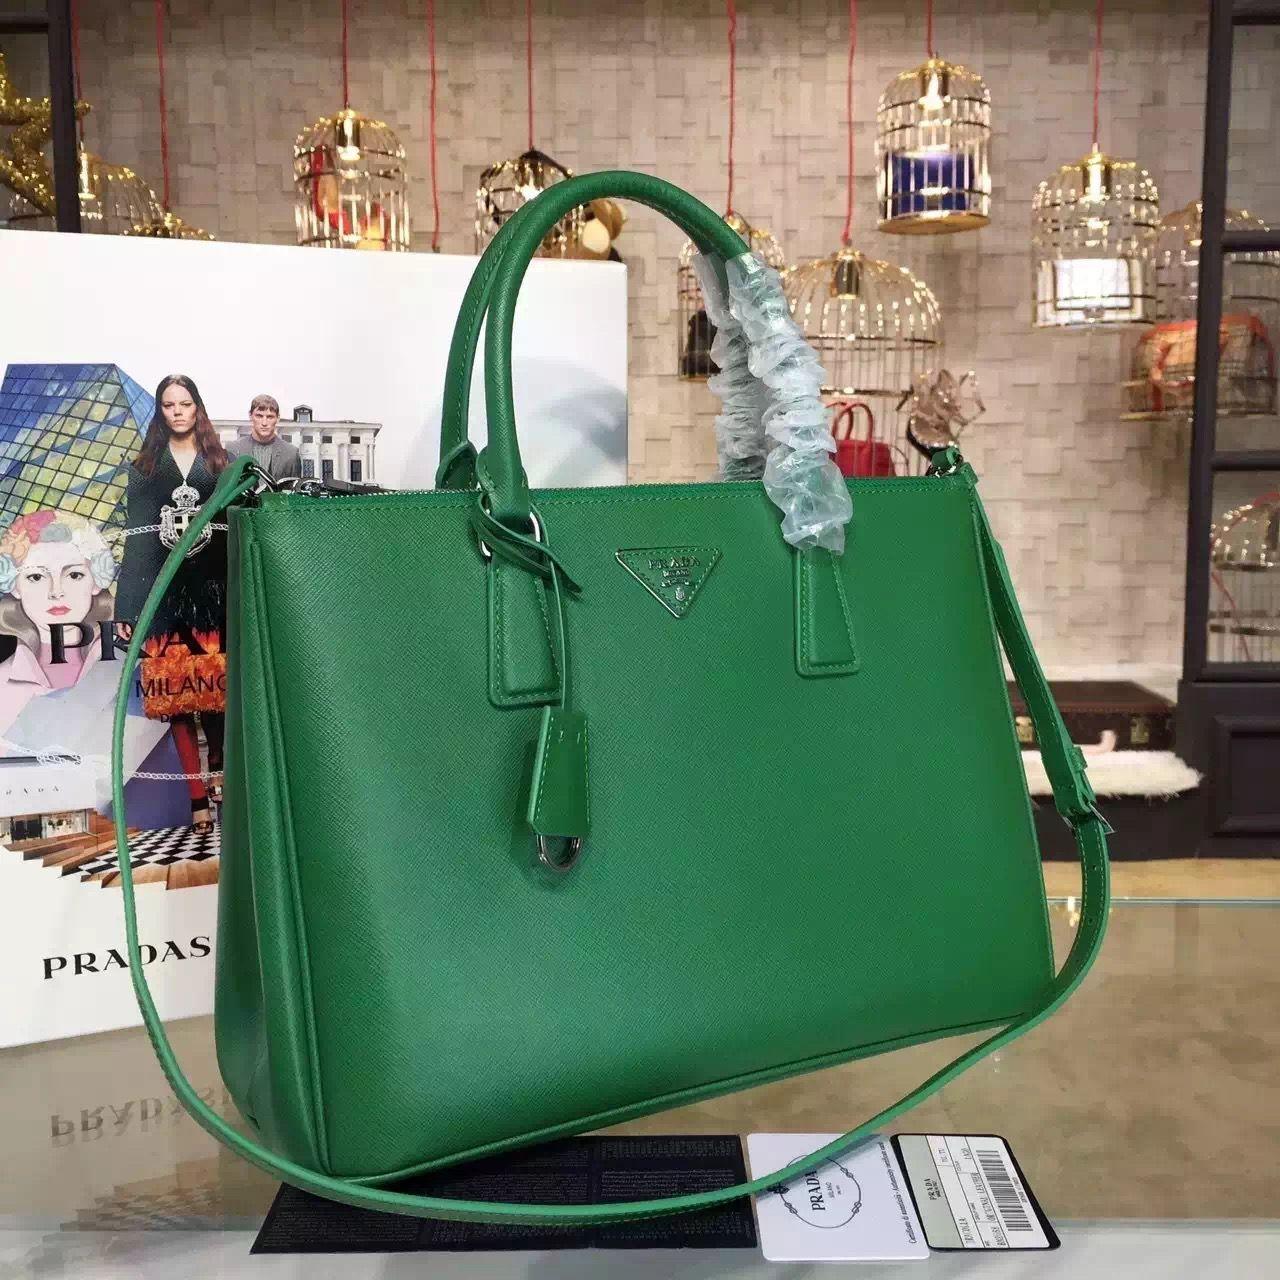 98d0f51c23b1 Prada 1BA274 Large Galleria Saffiano Leather Bag Green 2016